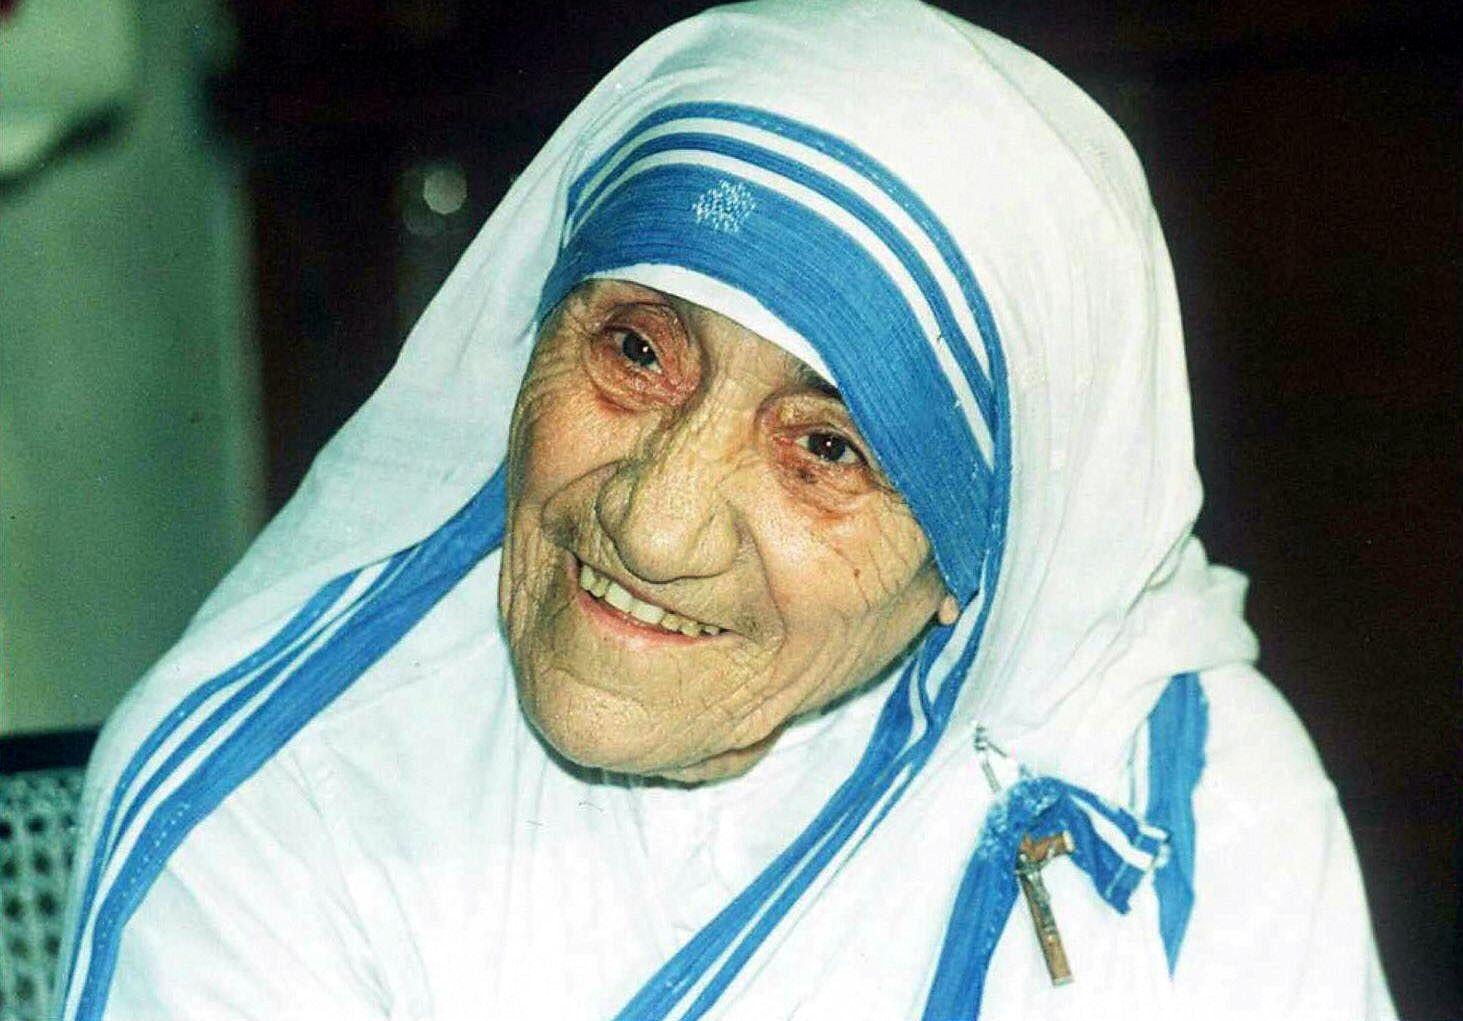 Mother Teresa smiles in Calcutta.